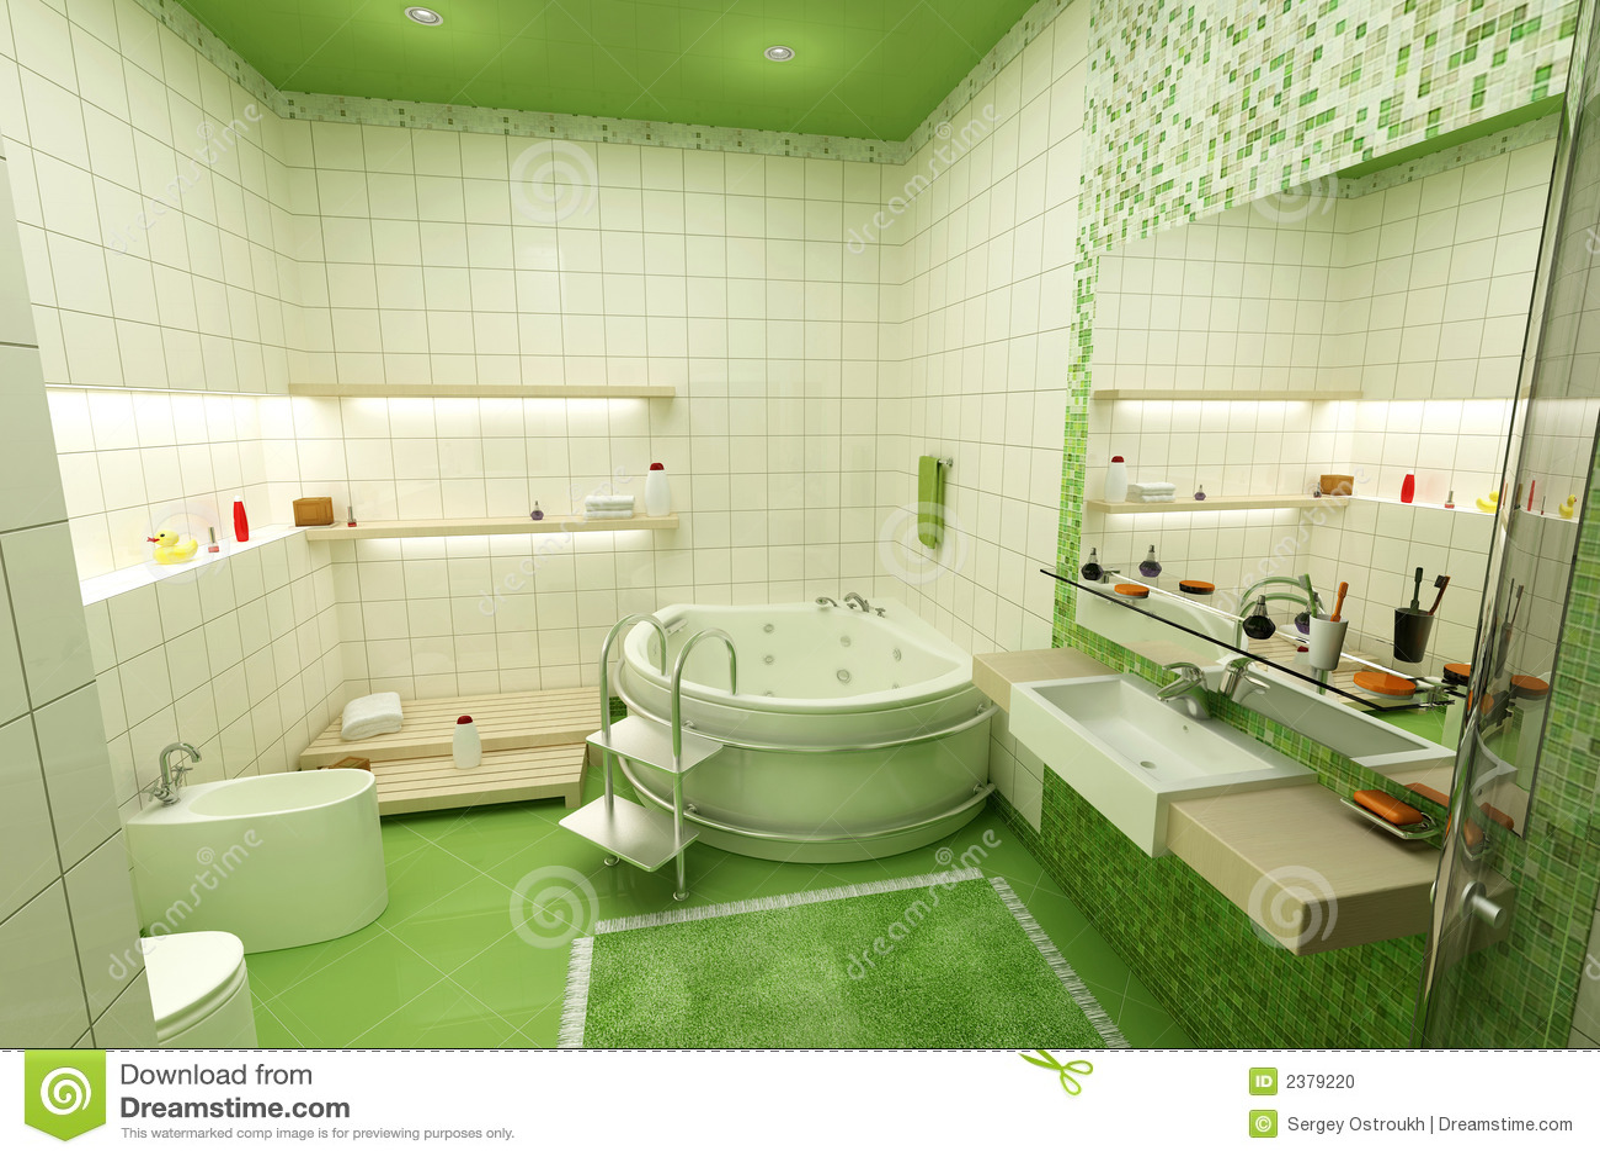 Groene badkamers